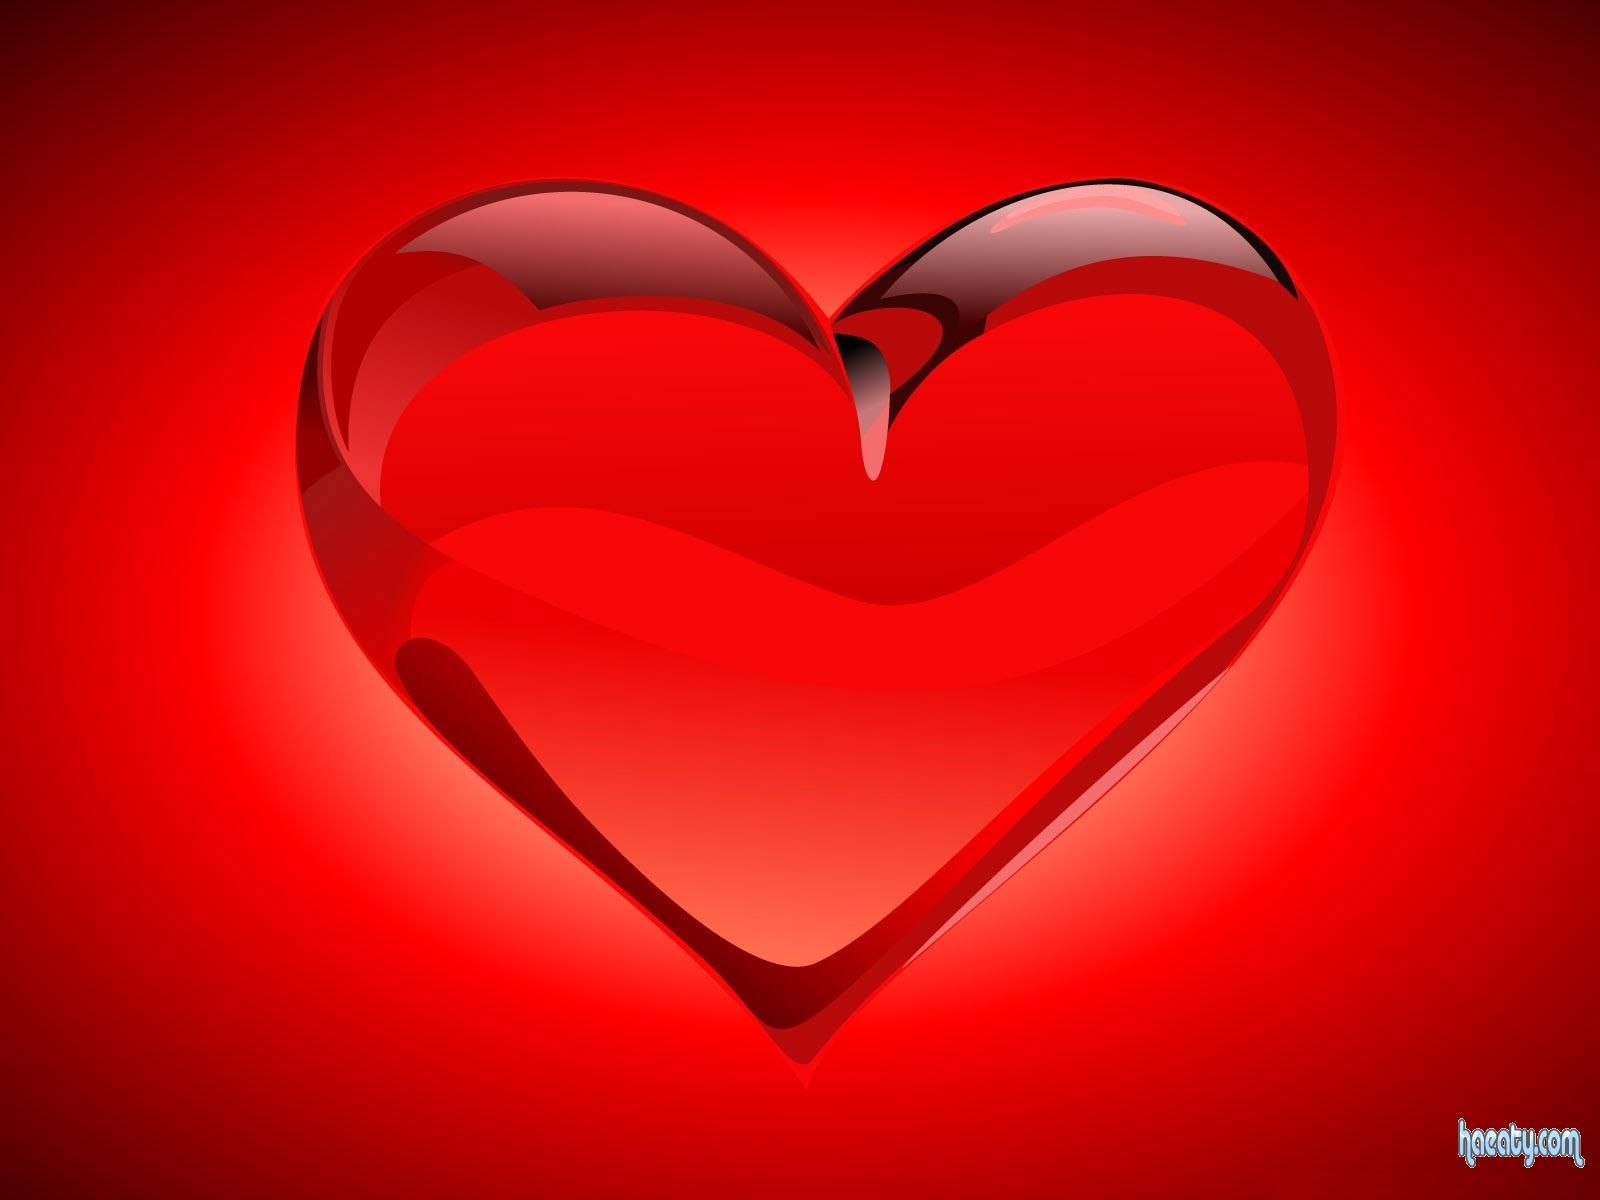 بالصور صور قلب حب , اجمل صور قلوب 3317 2